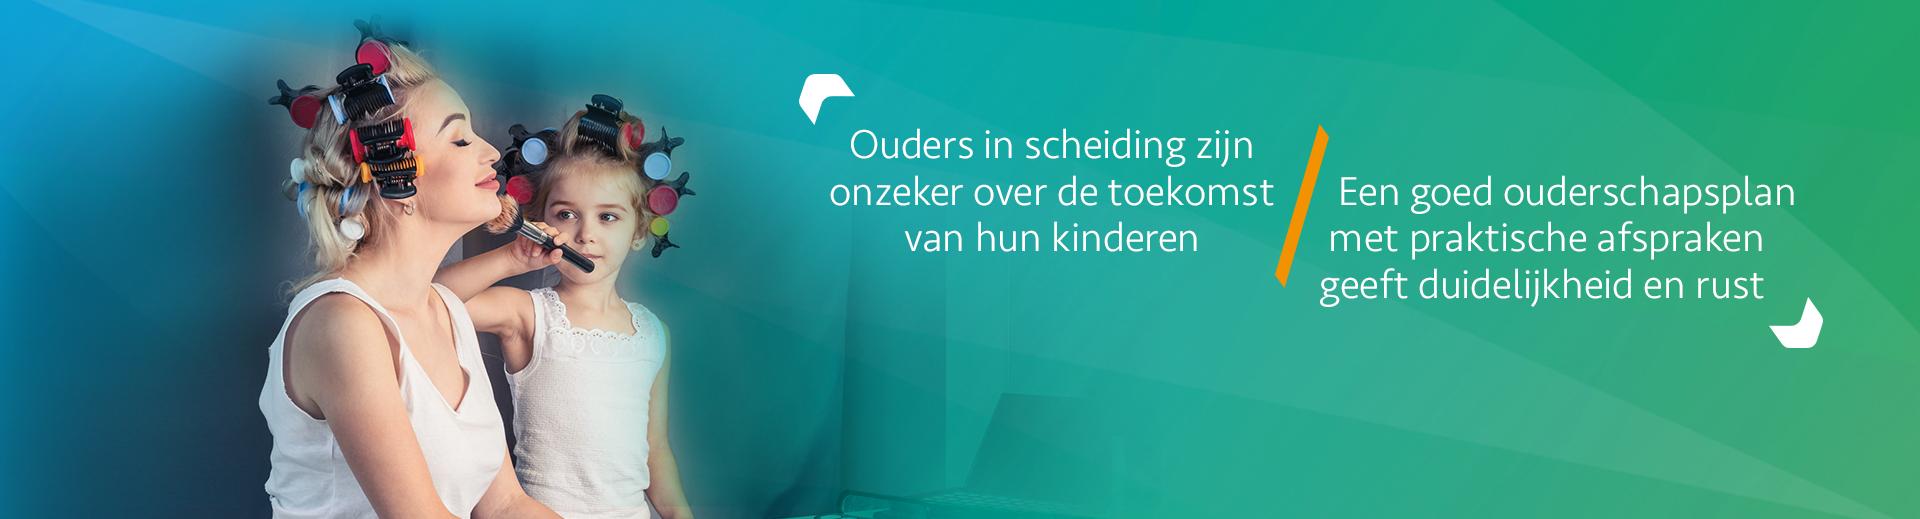 ouderschapsplan - Scheidingsplanner Almelo - Deventer - Nijverdal